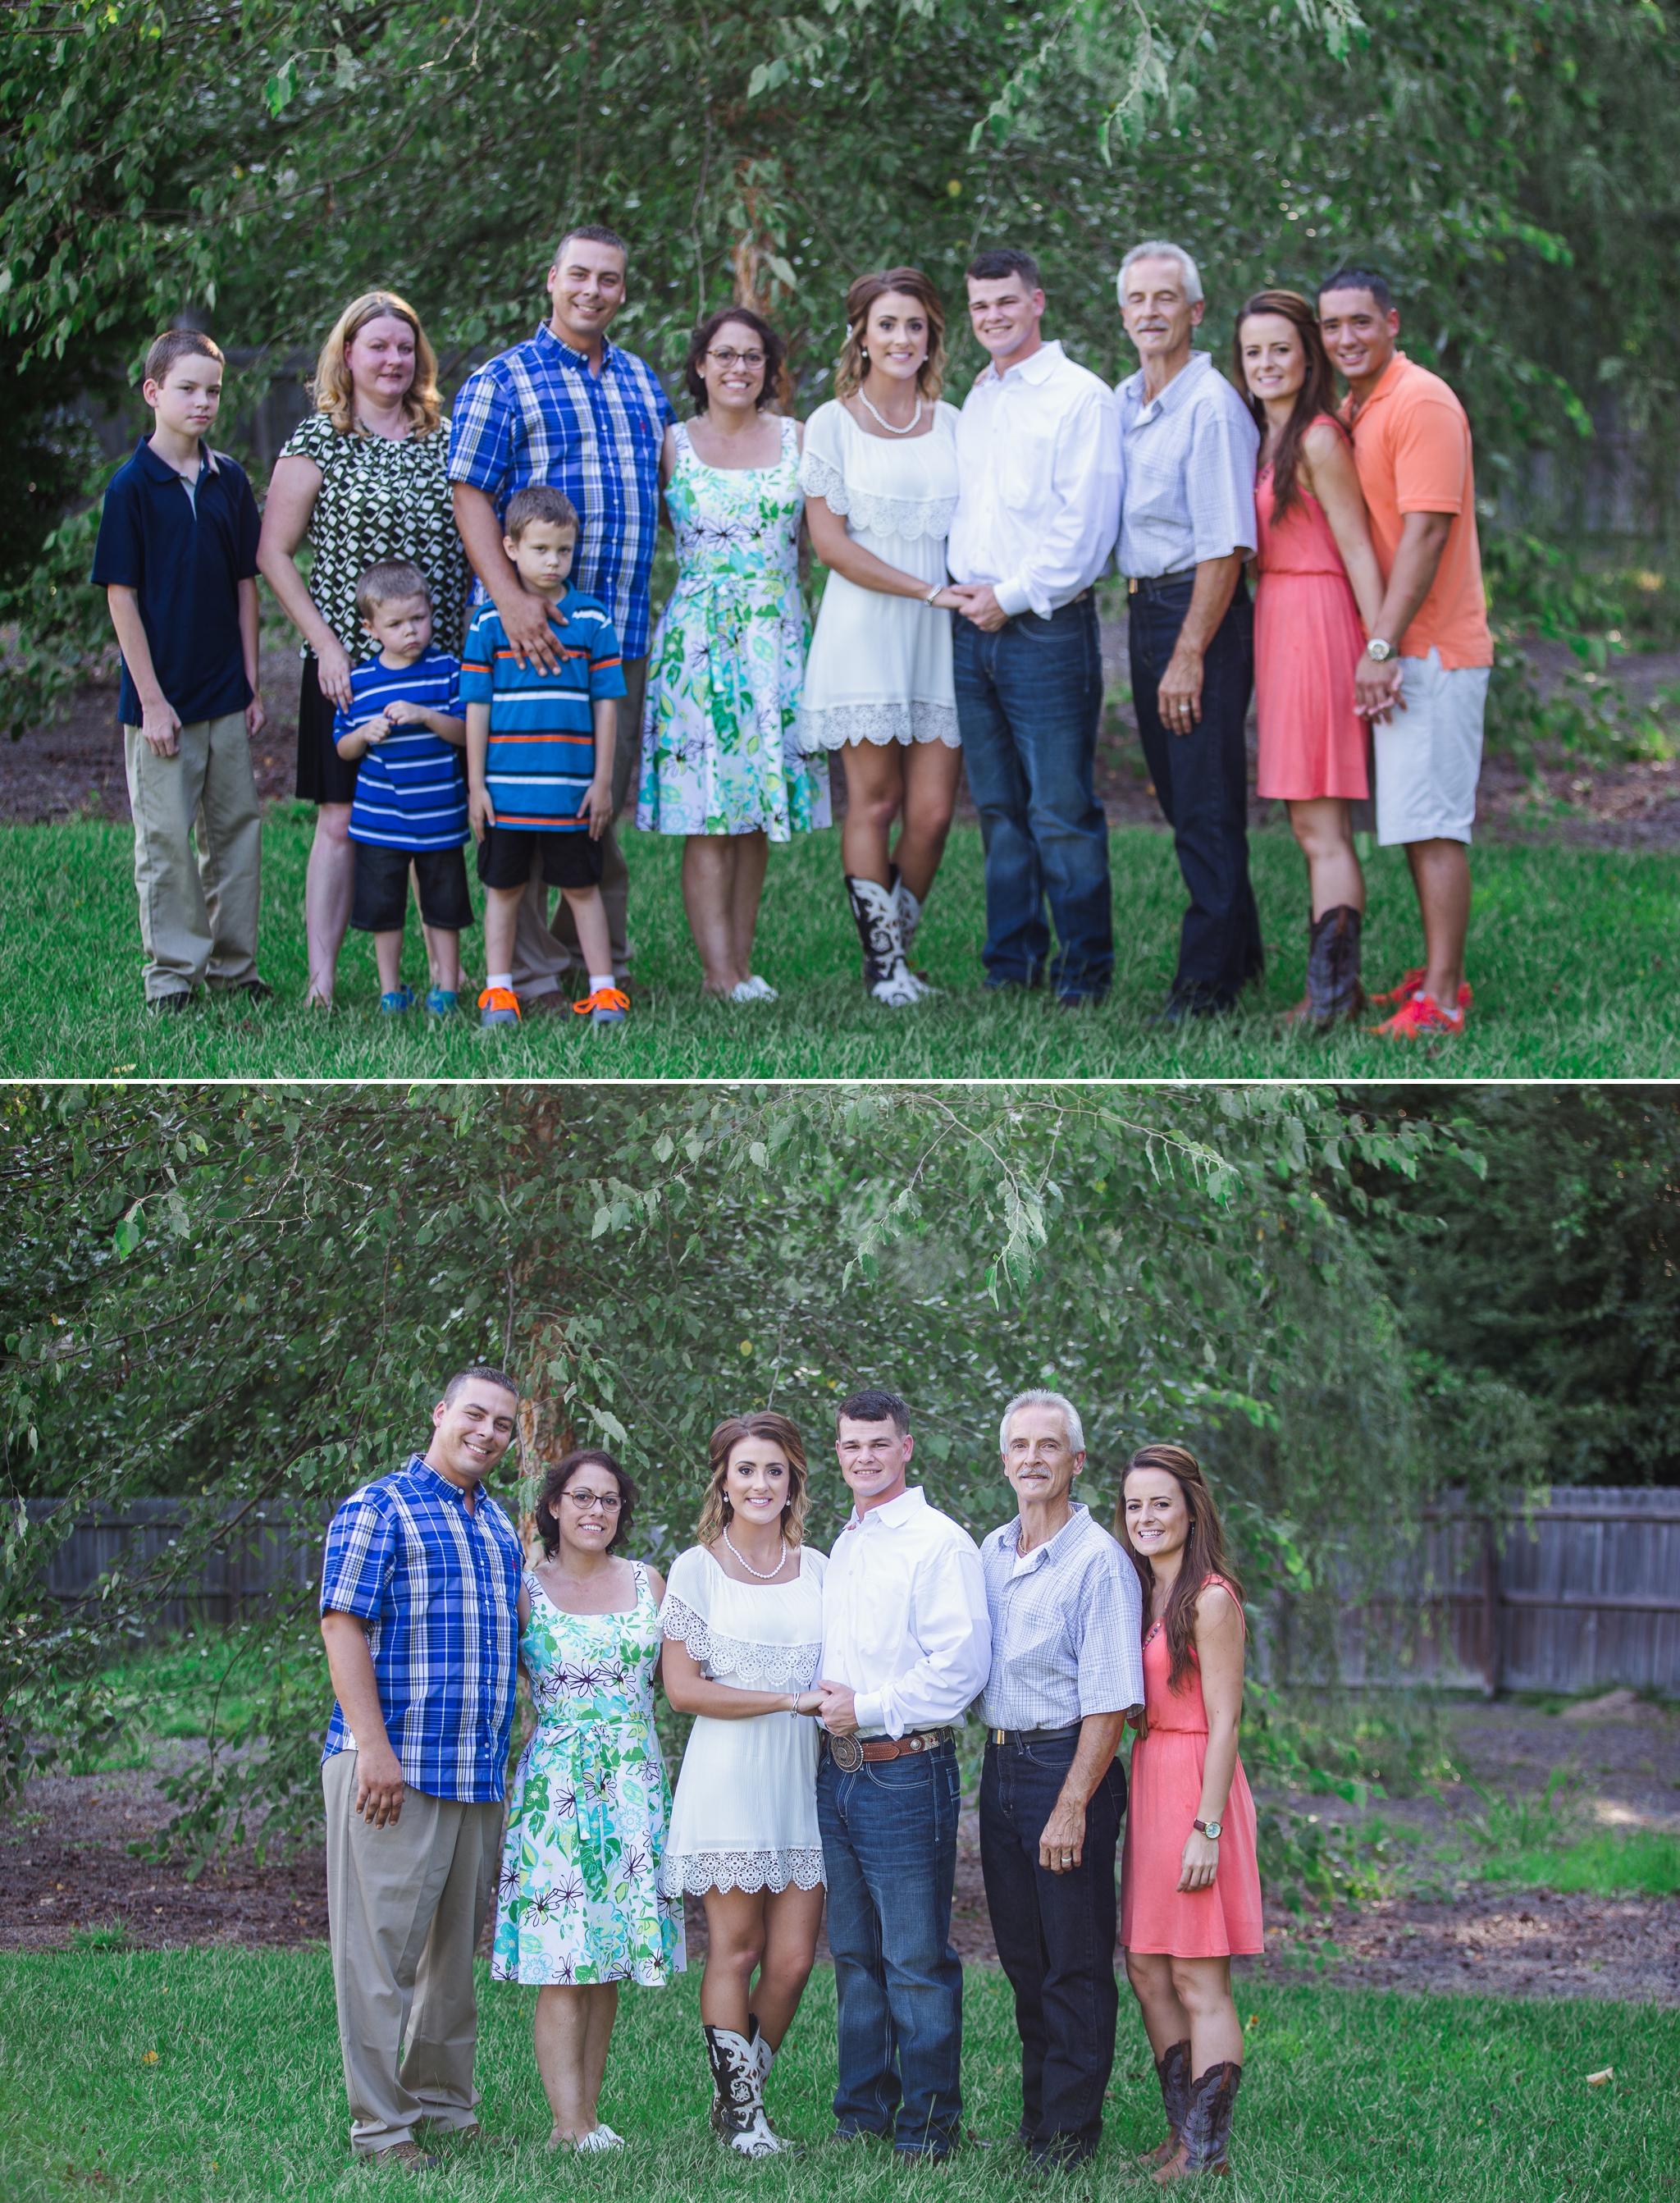 Southern Country Backyard Elopement - Fayetteville North Carolina Wedding Photographer - Johanna Dye Photography